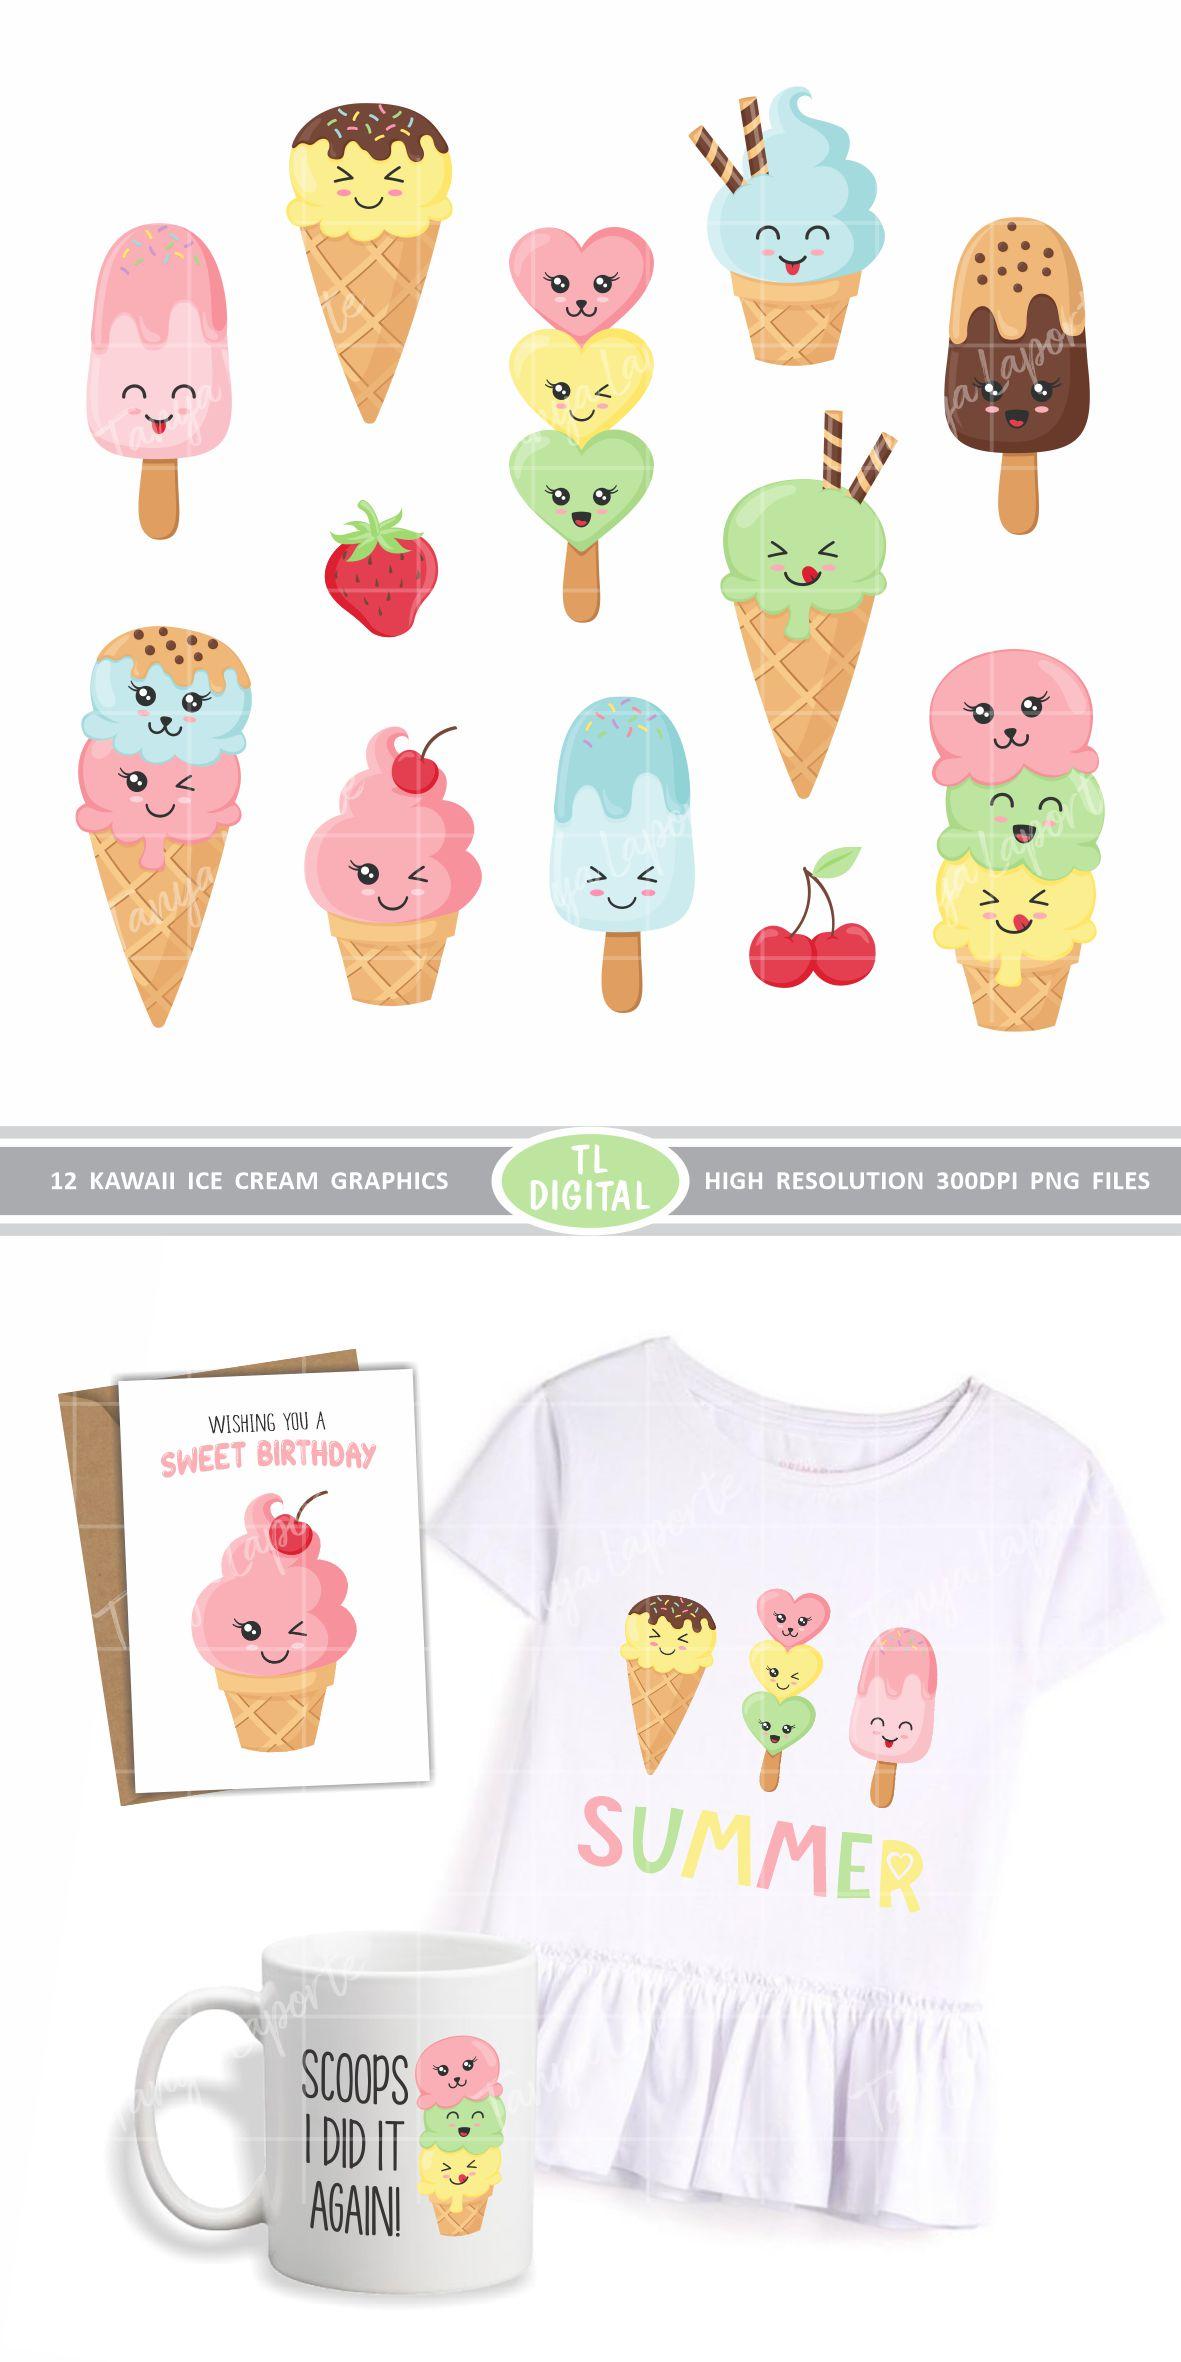 Kawaii Ice Cream Clipart Set - PNG Files - 12 Graphics example image 2